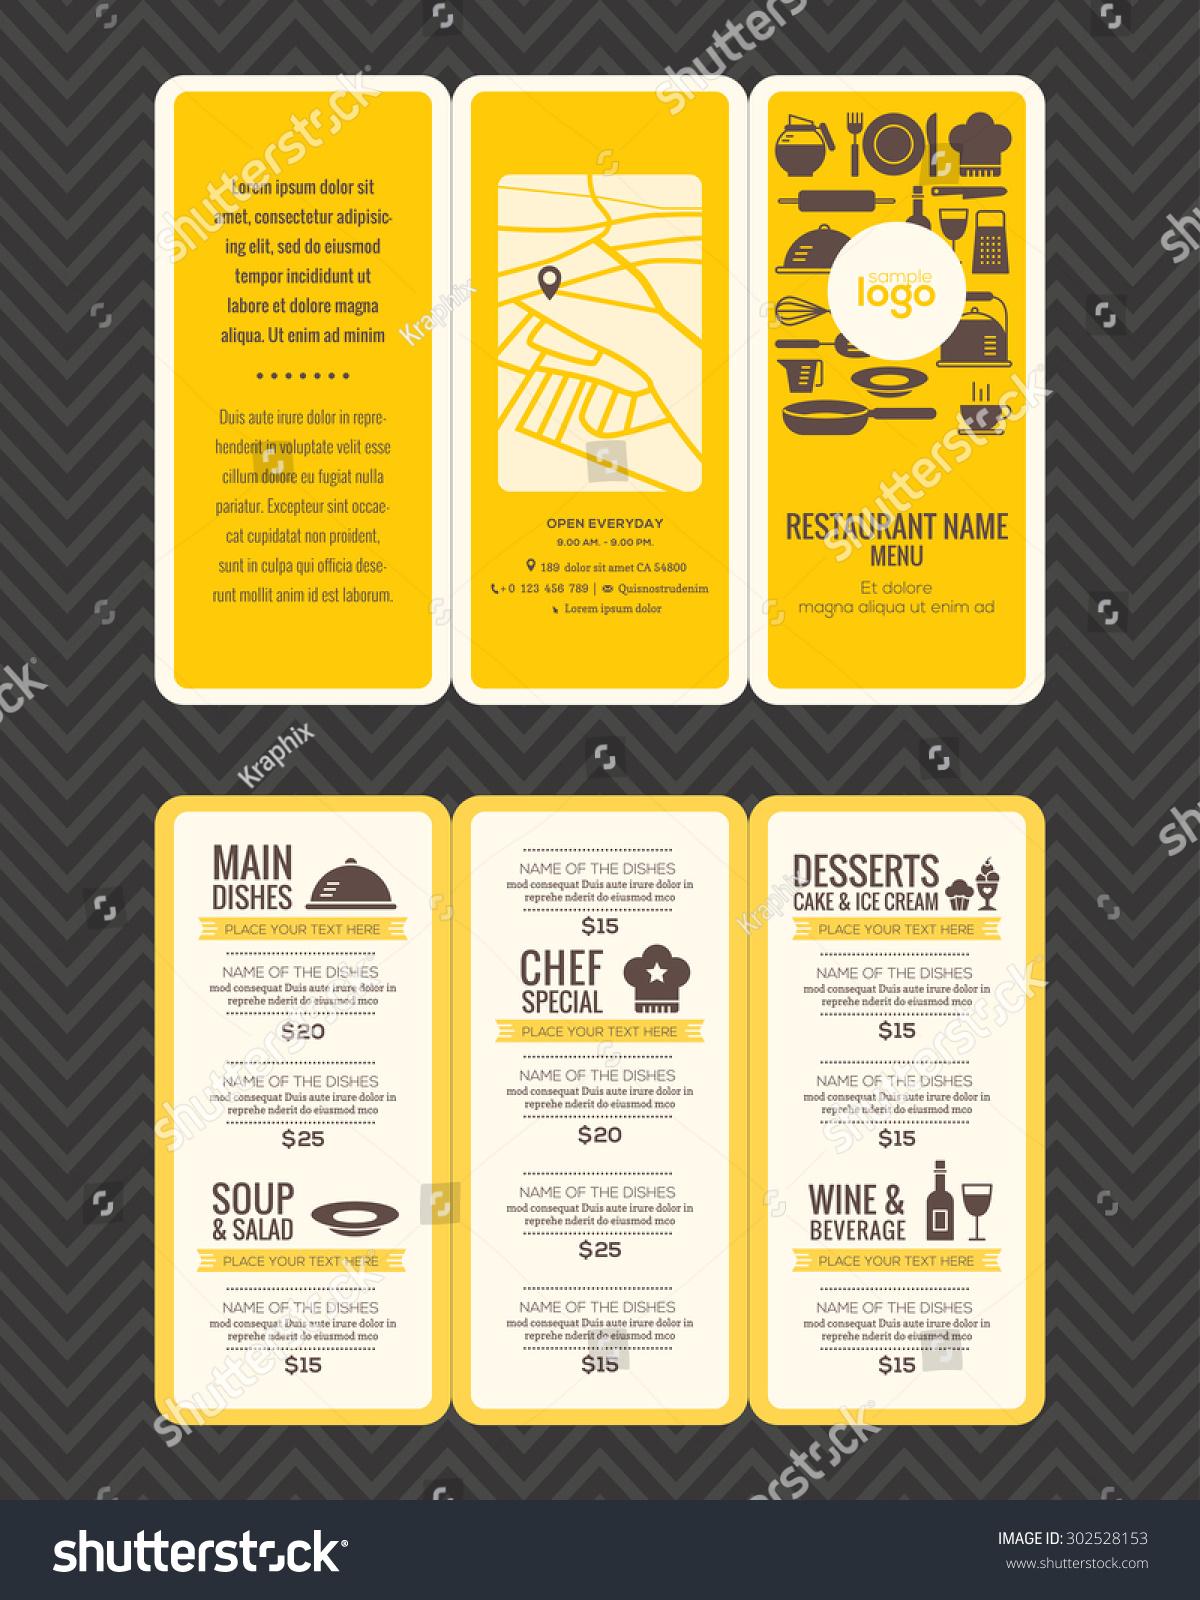 modern restaurant menu design pamphlet vector template in